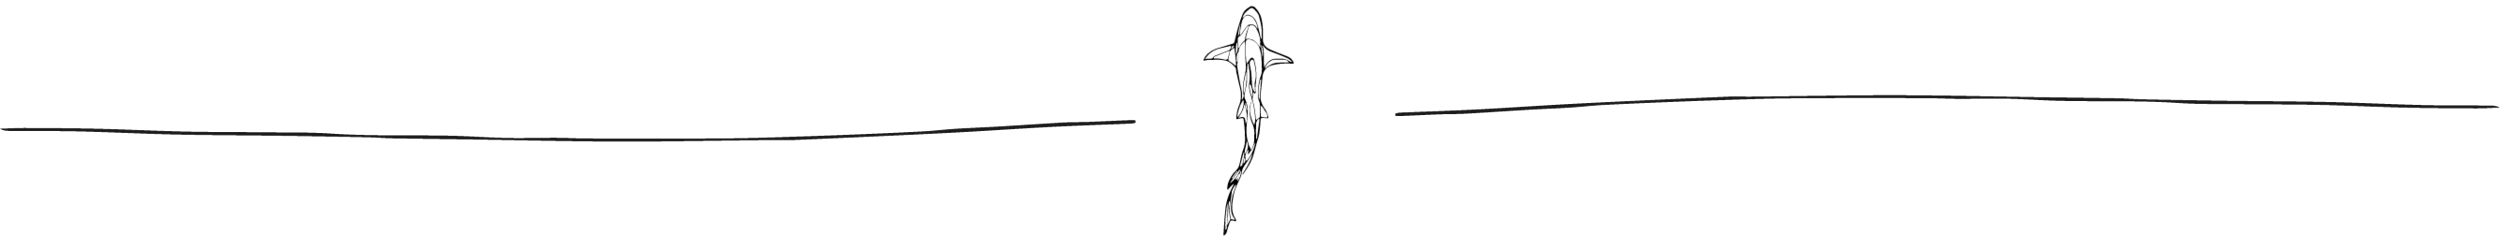 NCA Shark Illustration.png